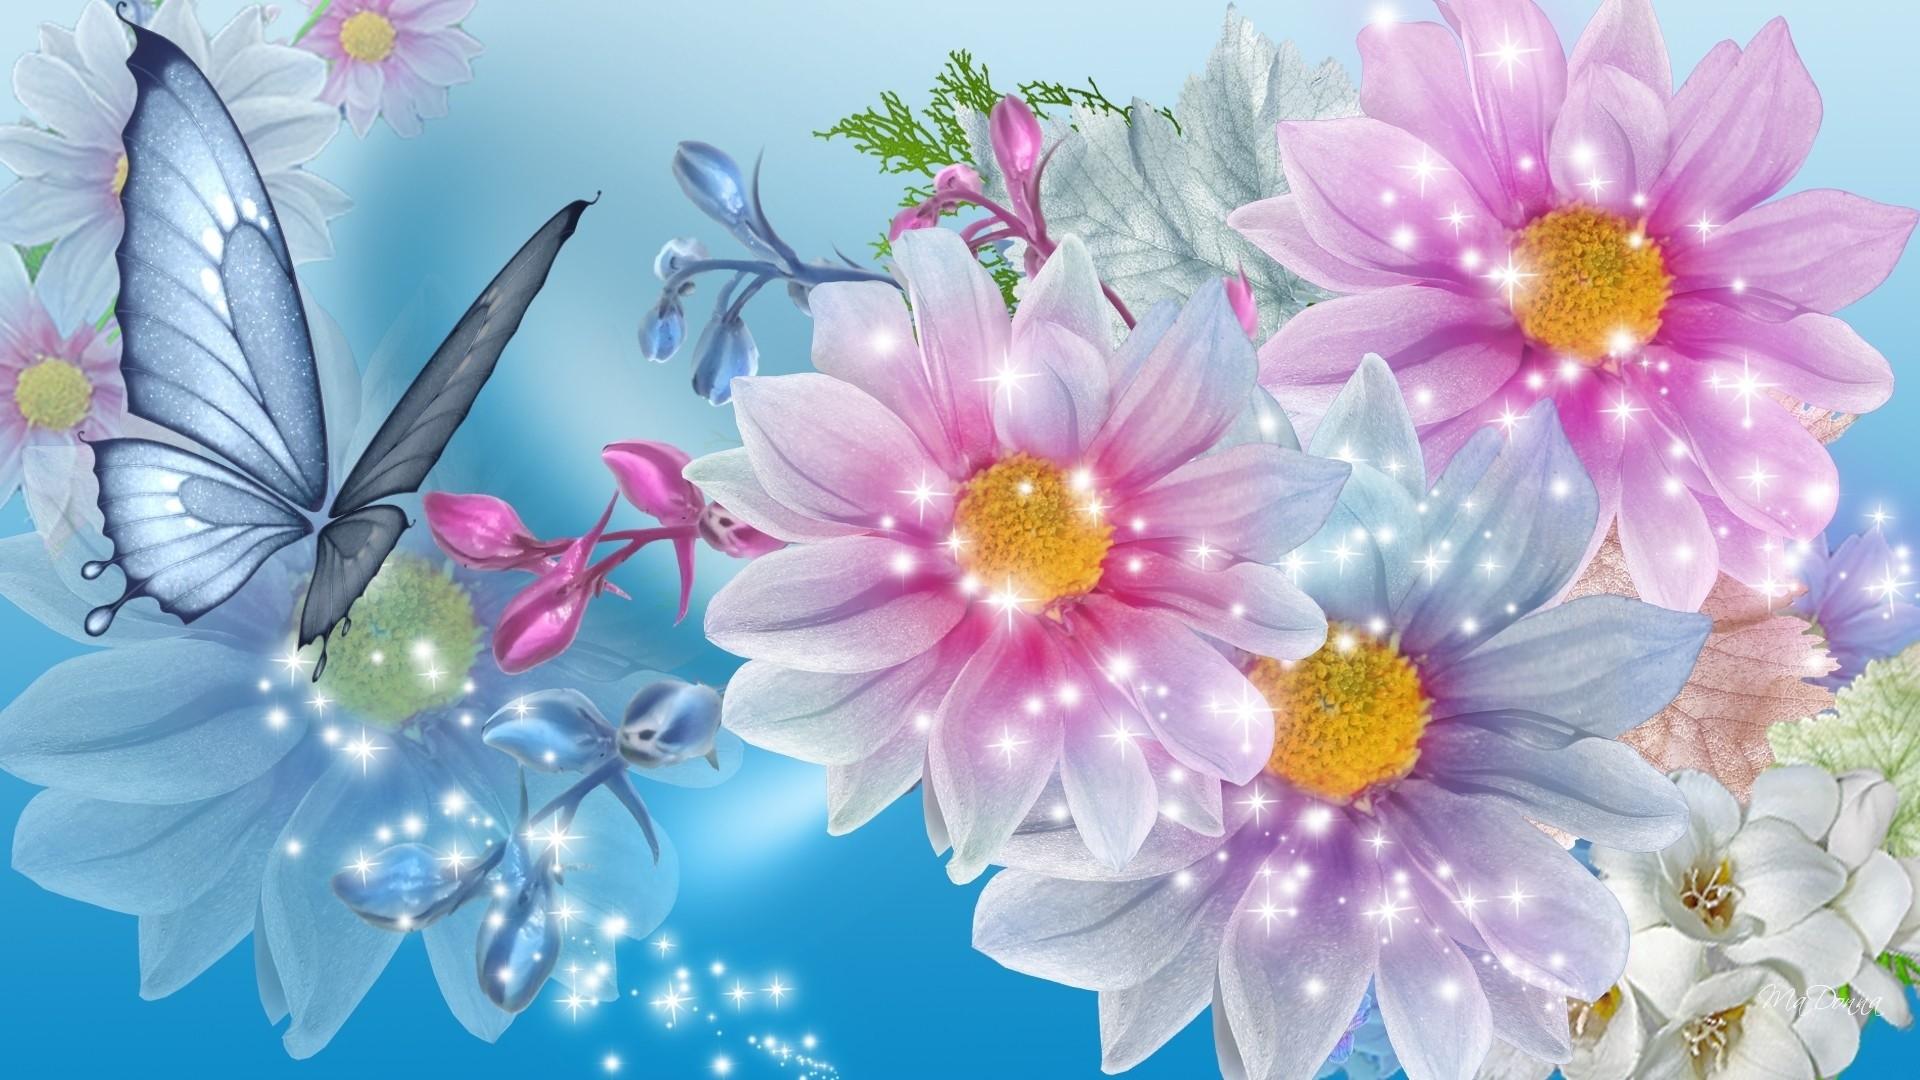 30 Beautiful Flower Wallpaper Free To Download